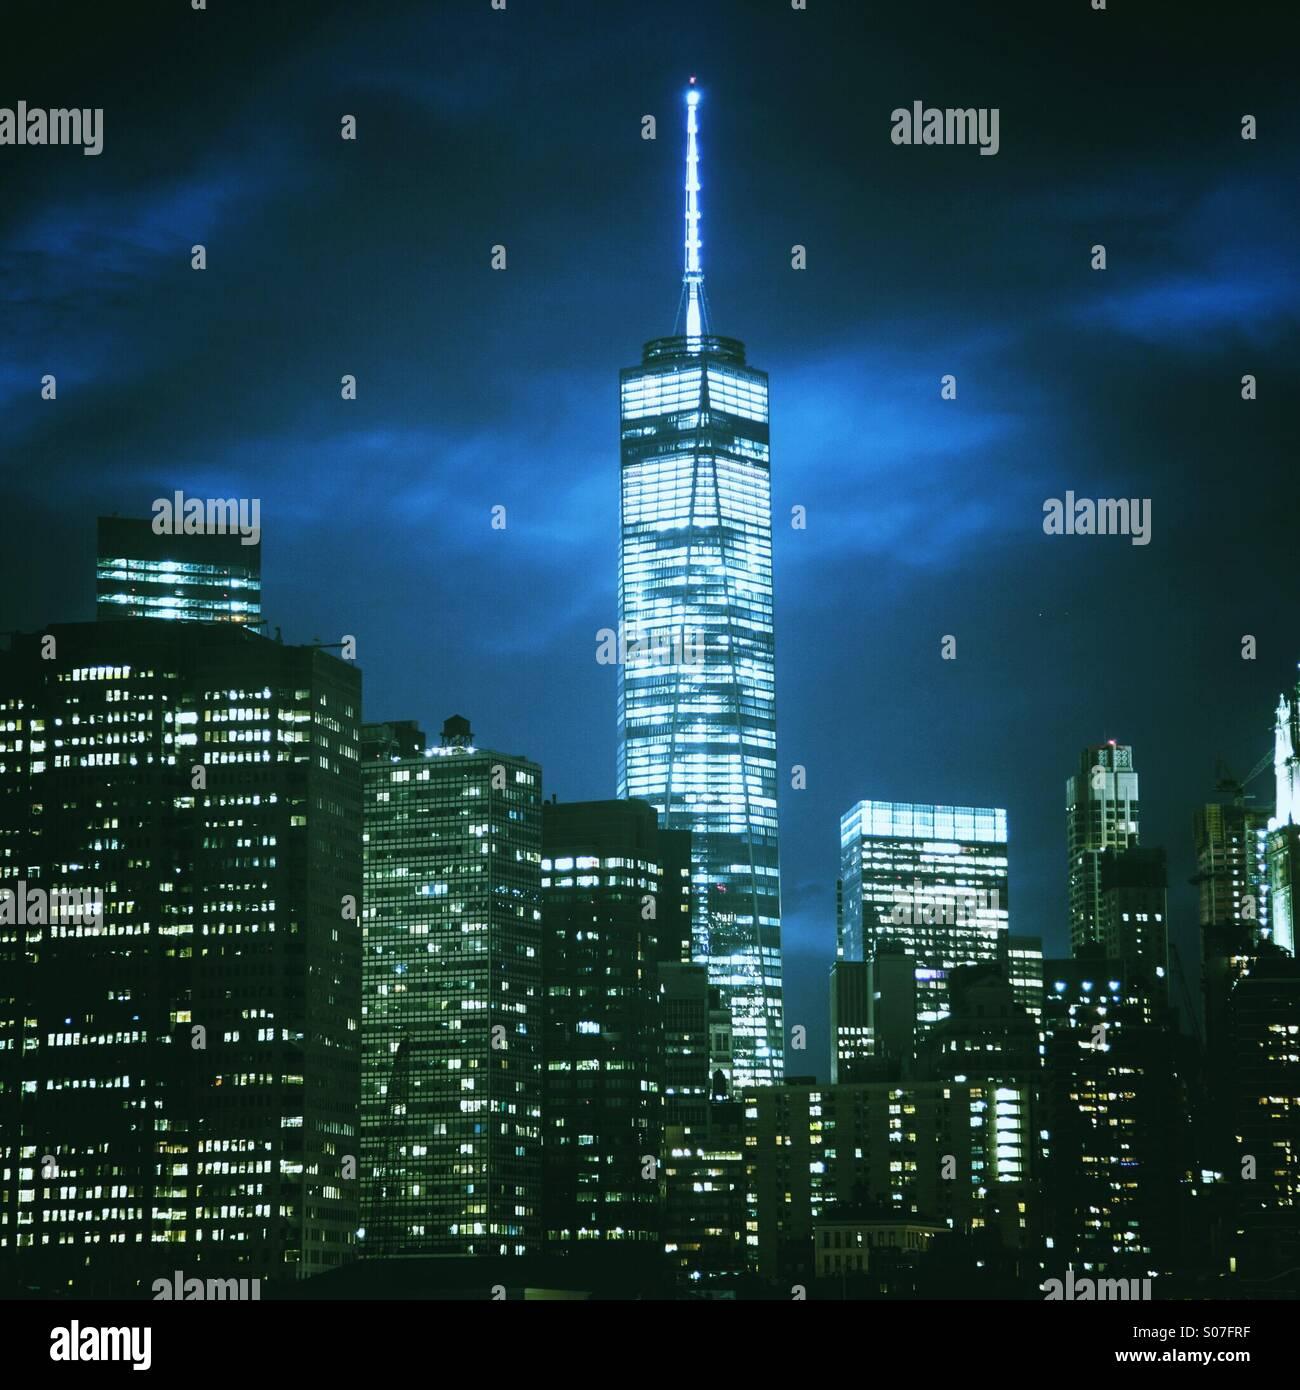 Manhattan skyline photo de nuit y compris new World Trade Center Photo Stock